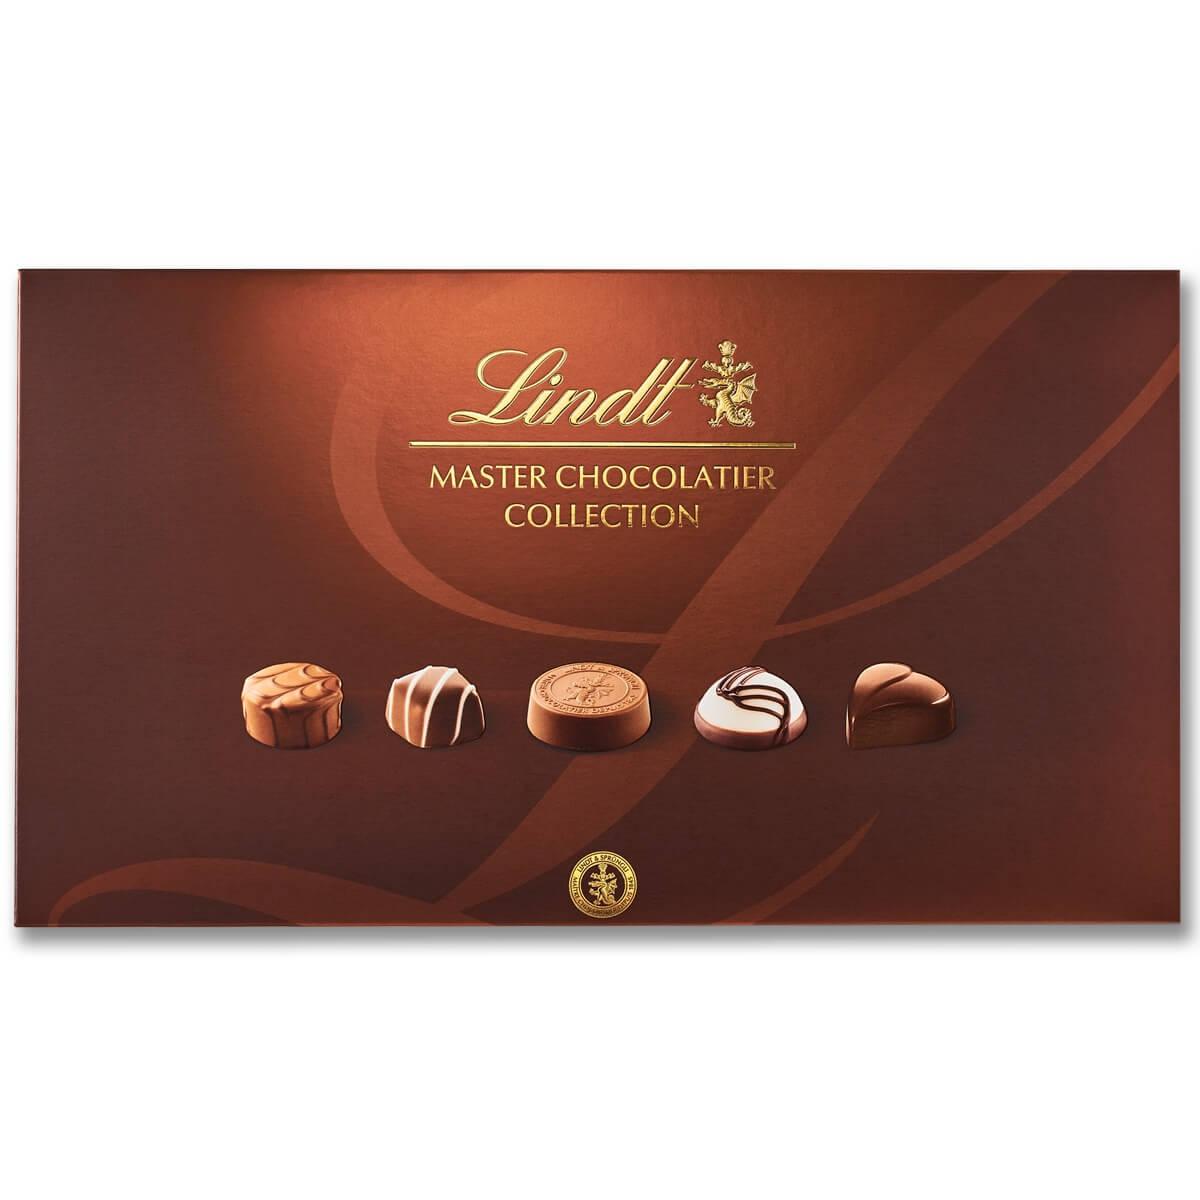 Bild av Lindt Master Chocolatier Collection 320g